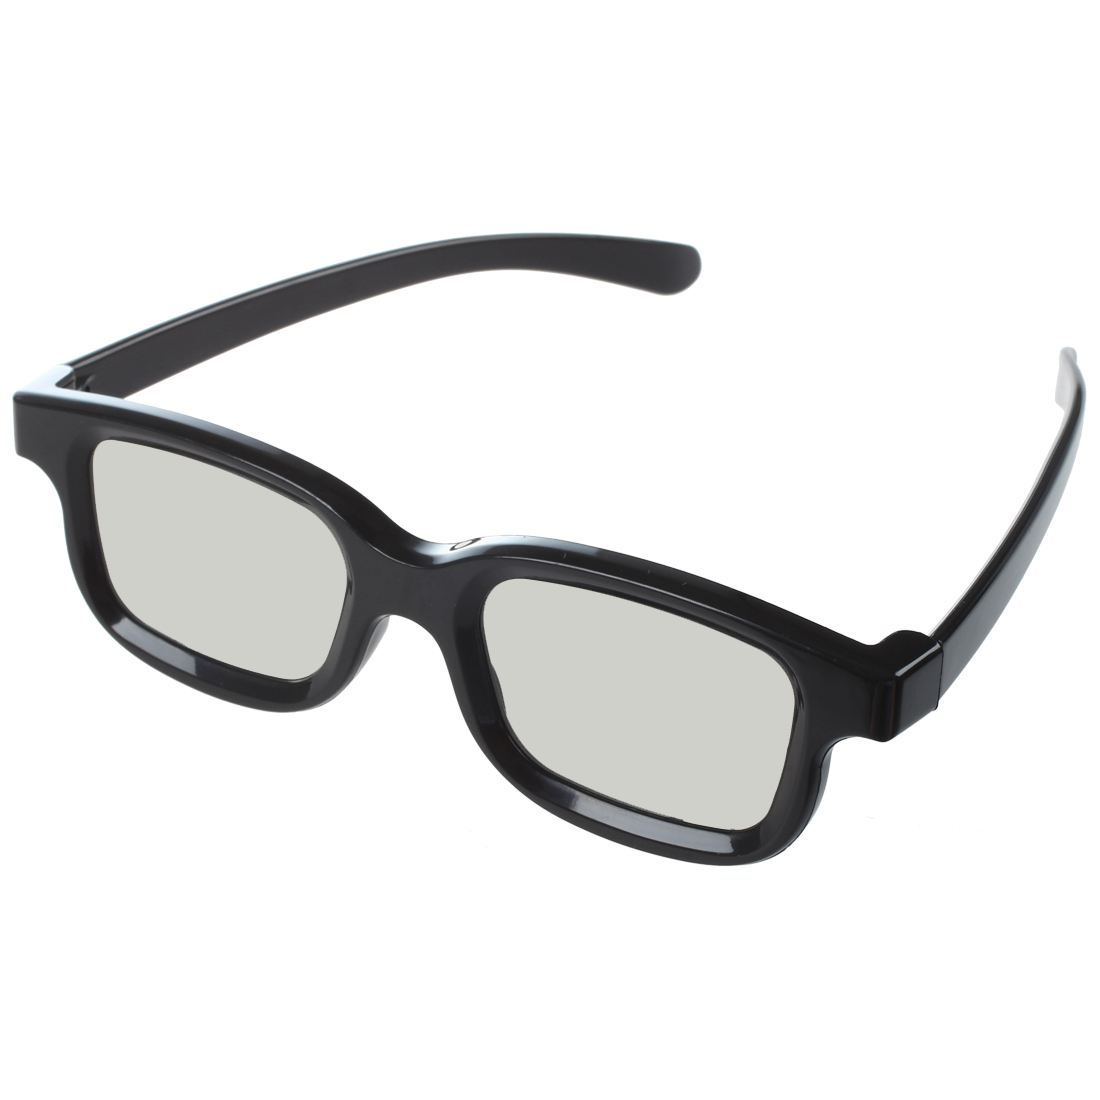 Top Deals 3D Glasses For LG Cinema 3D TVs - 2 Pairs